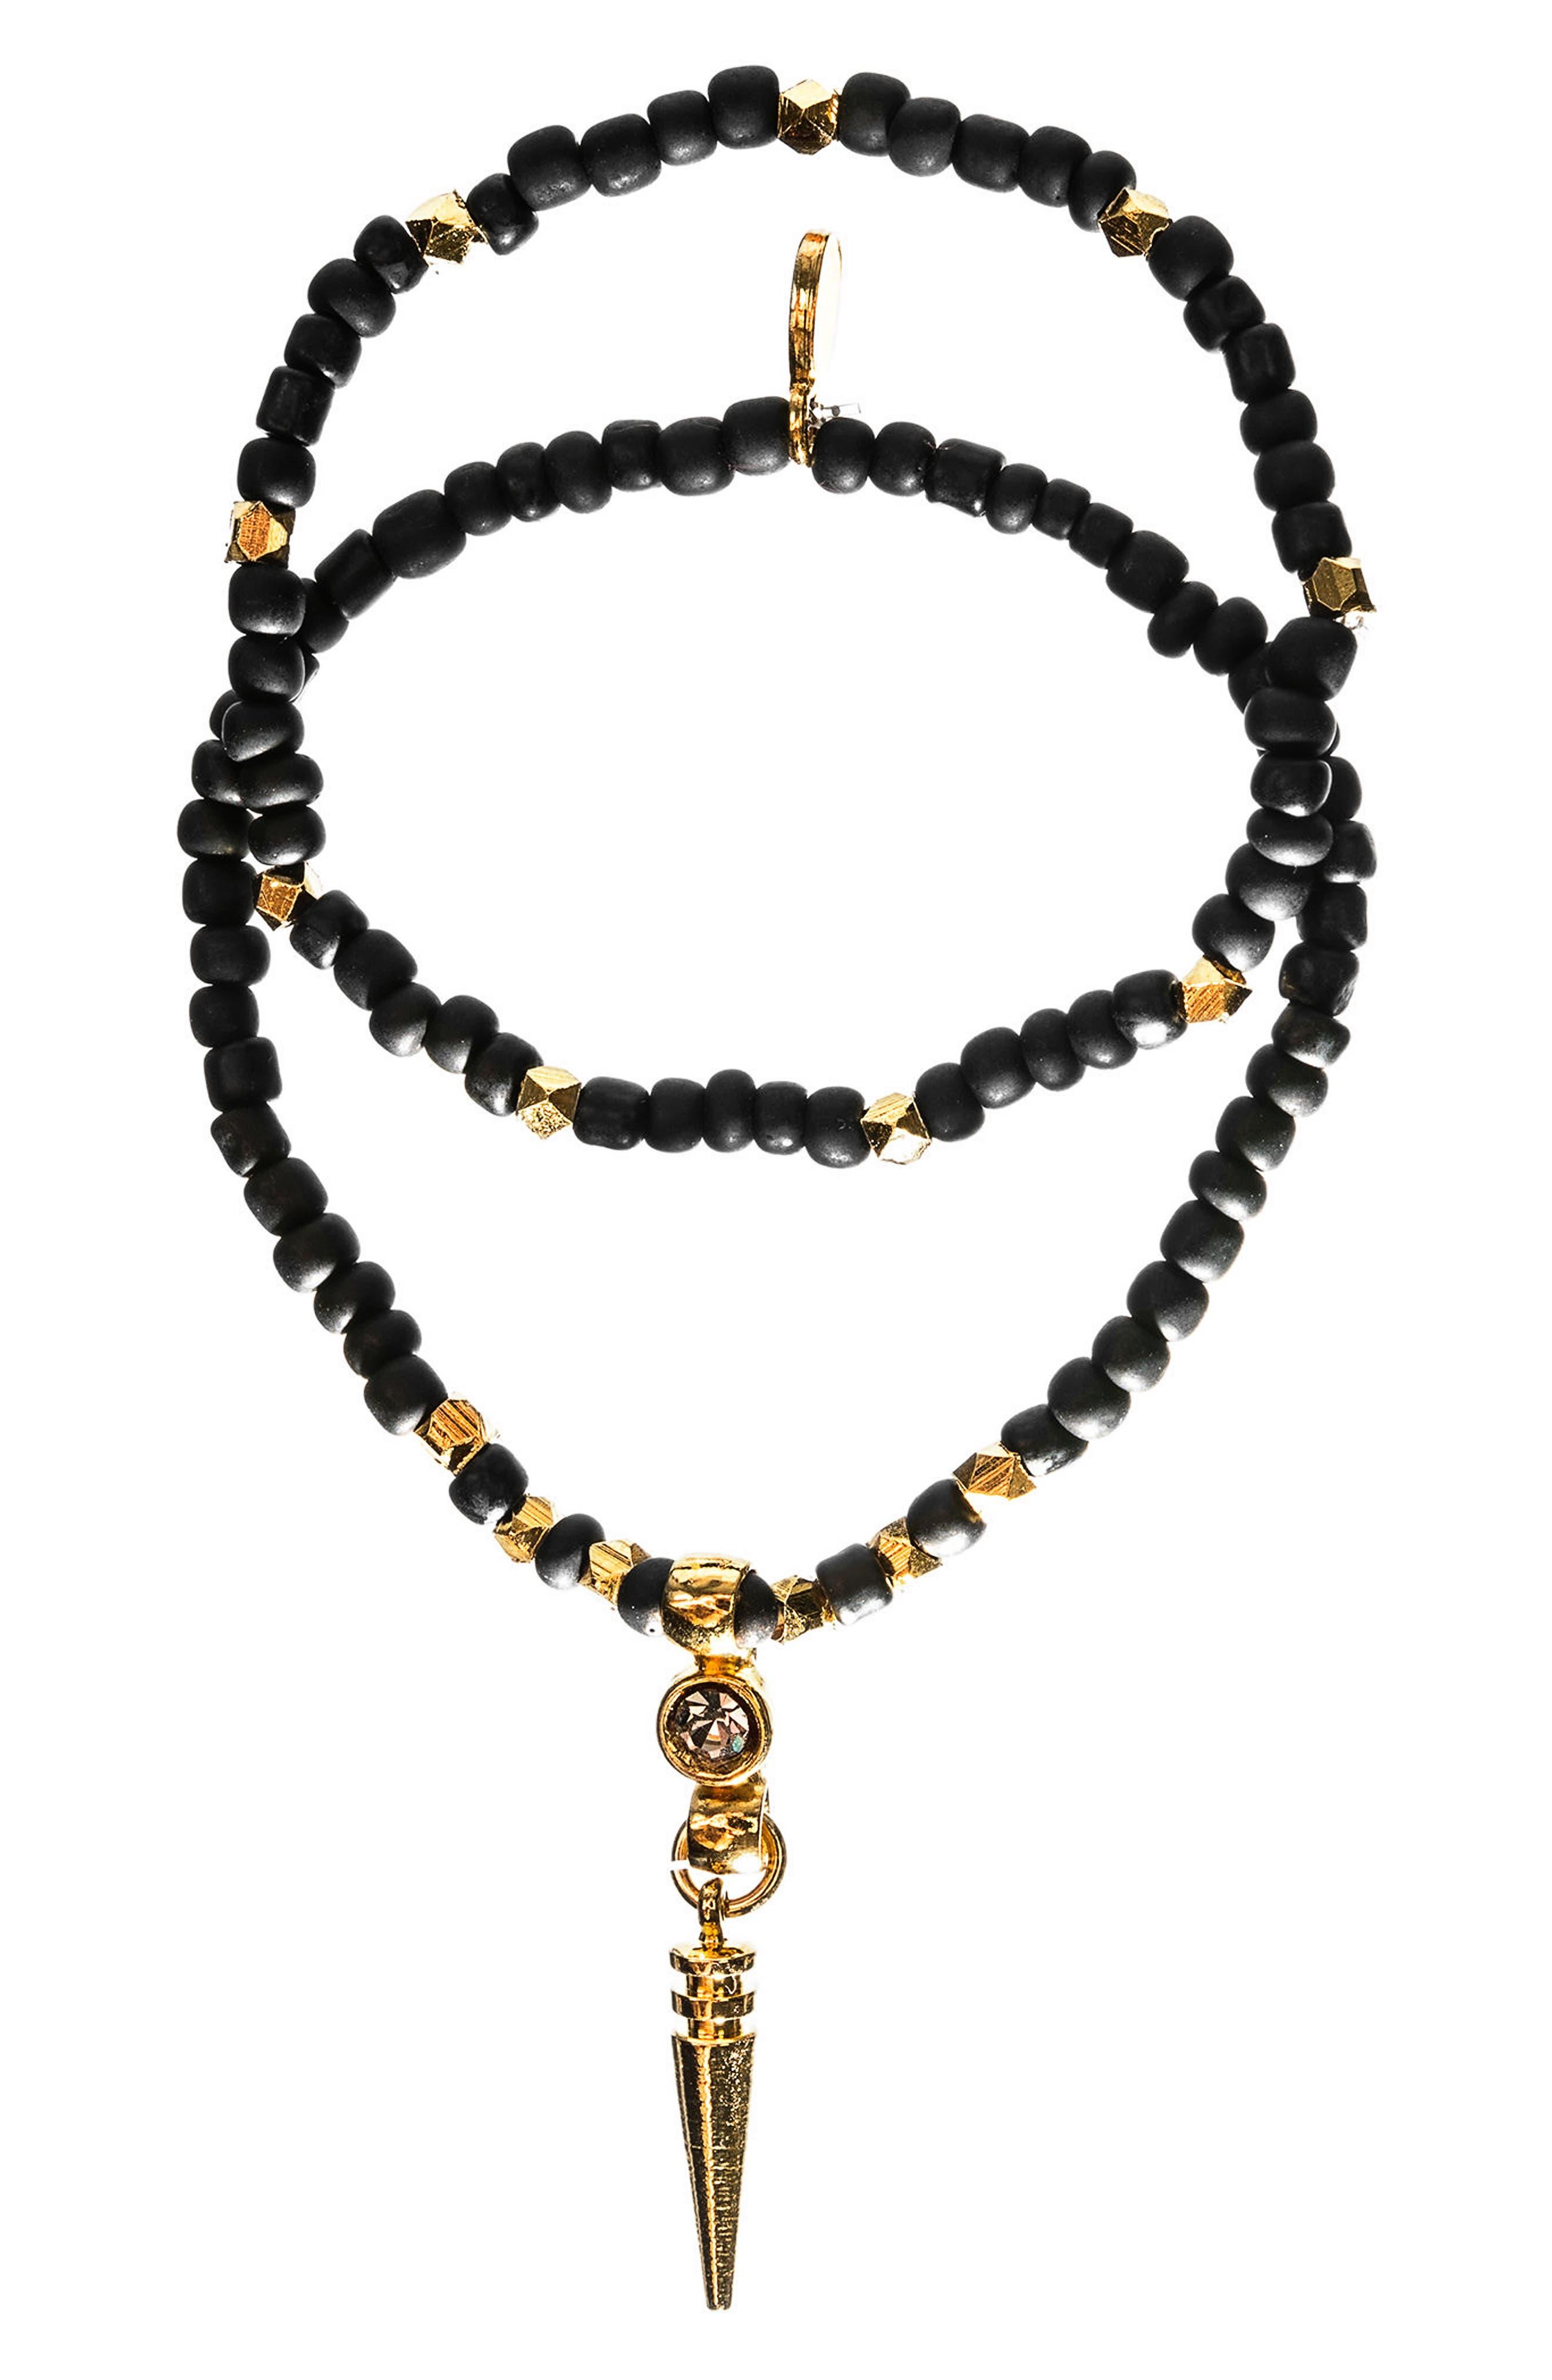 Main Image - MHART Crystal Spike Set of 2 Beaded Stretch Bracelets